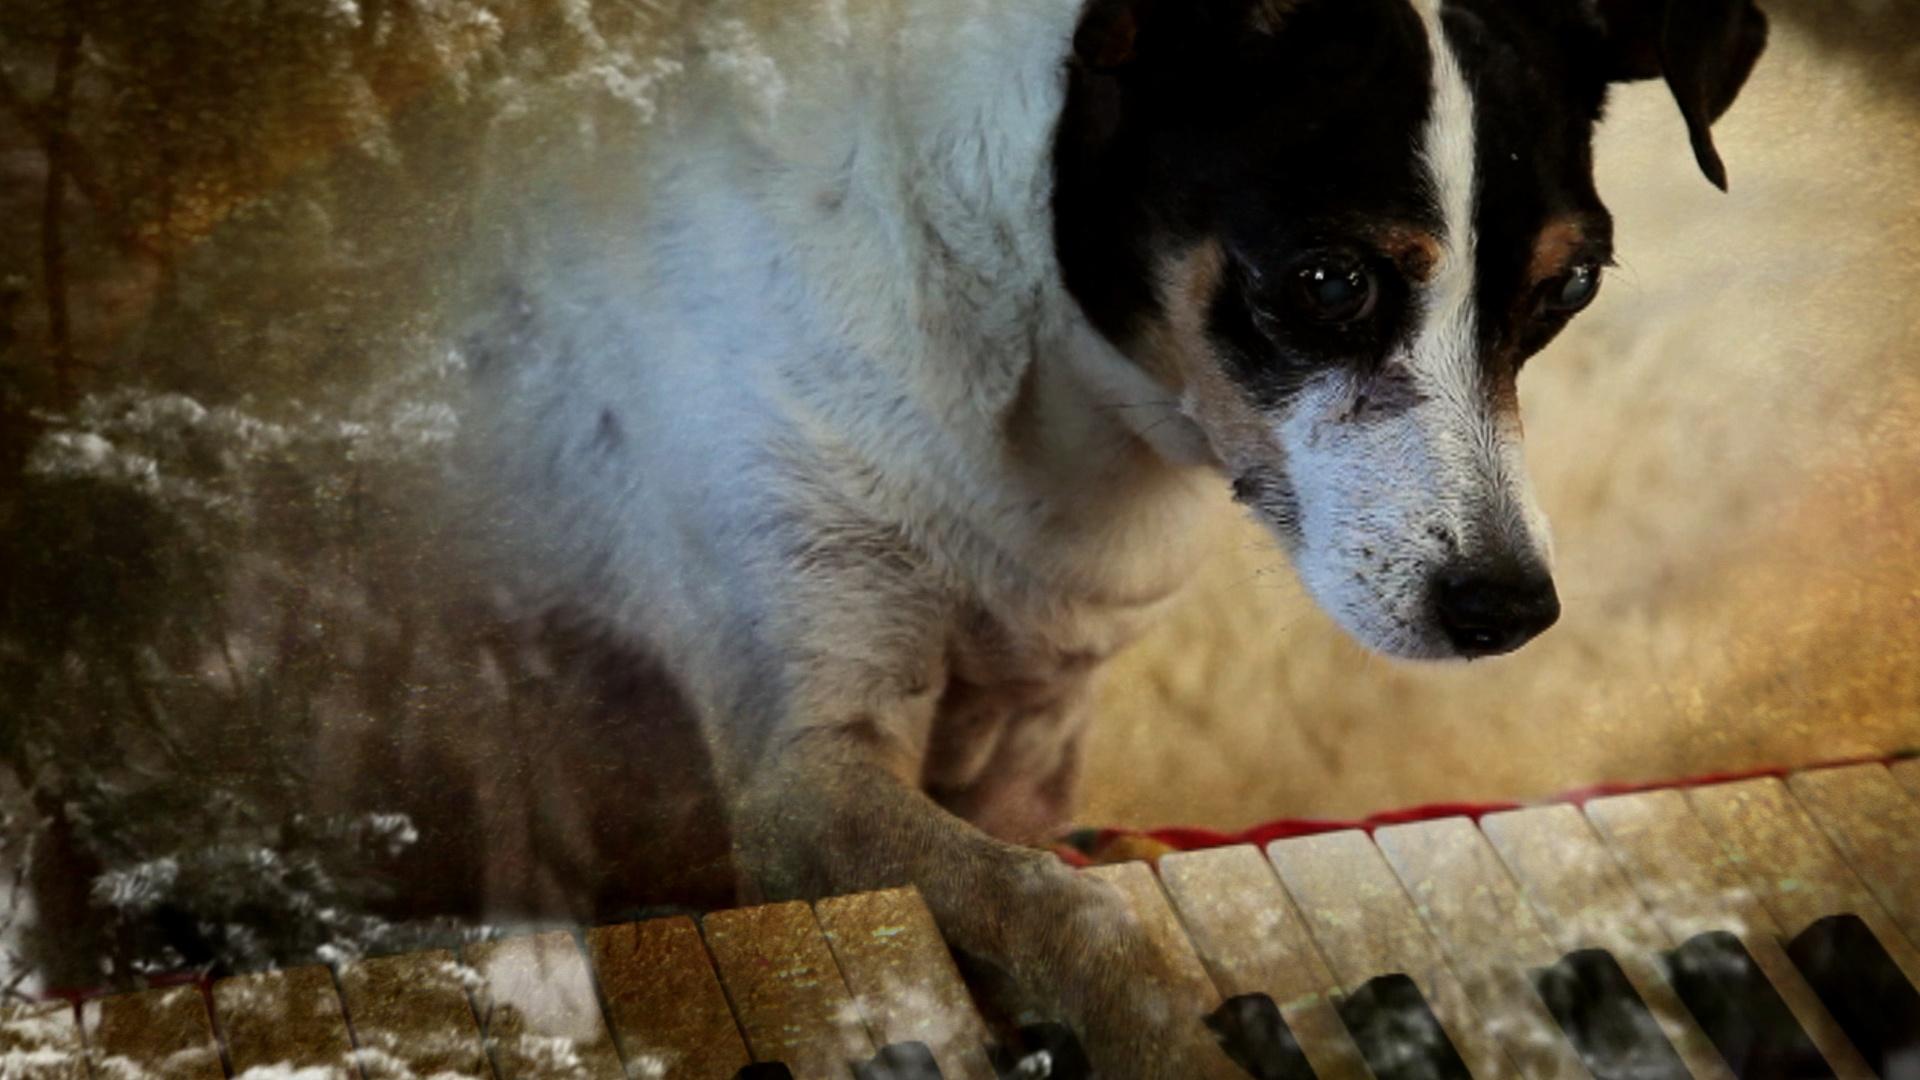 Lolabelle playing keyboard